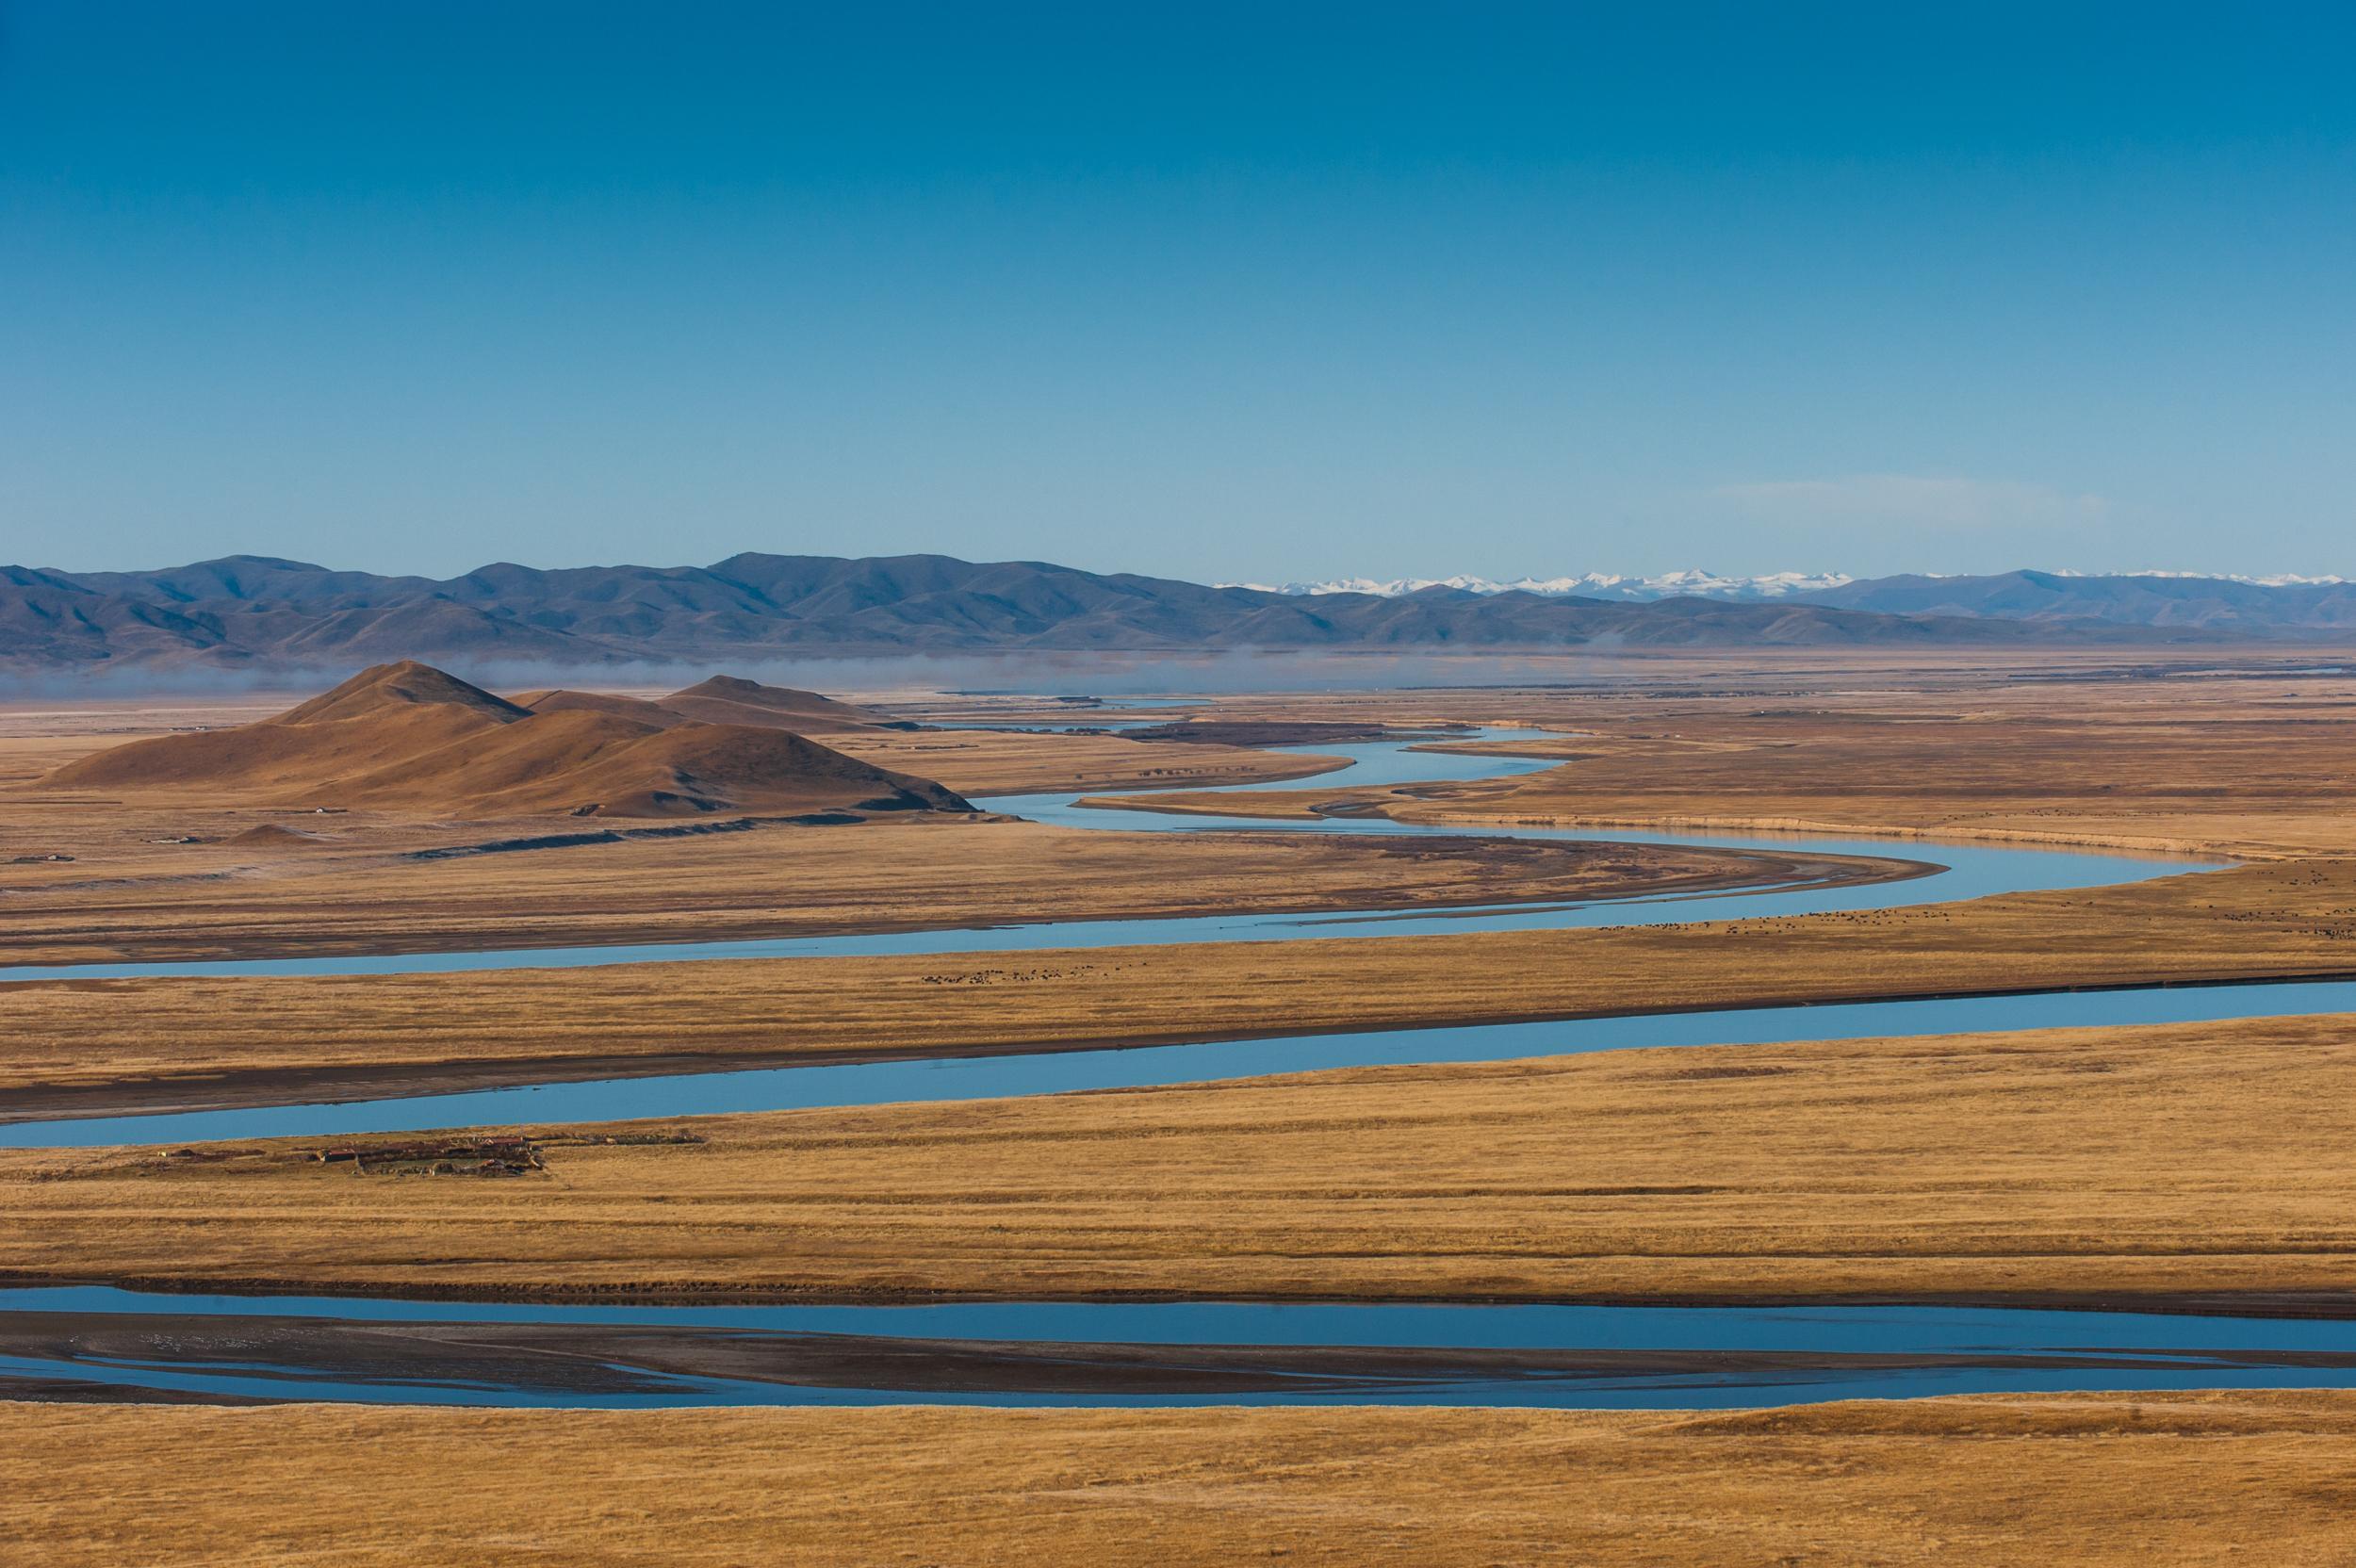 The Yellow river _DSC9052.jpg